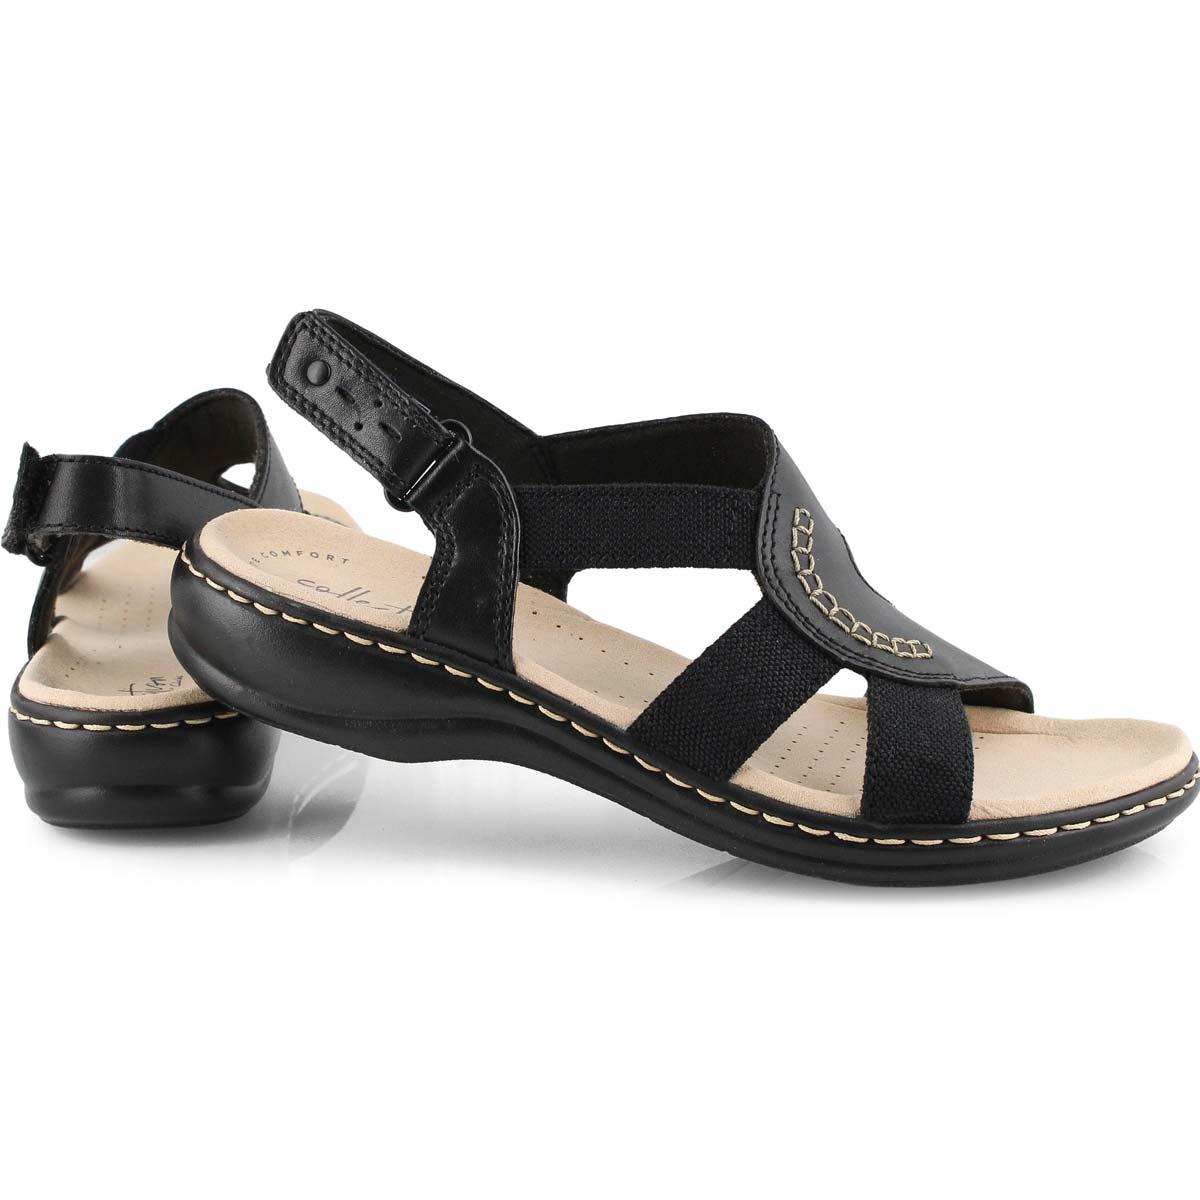 Women's Leisa Joy Casual Sandal - Black